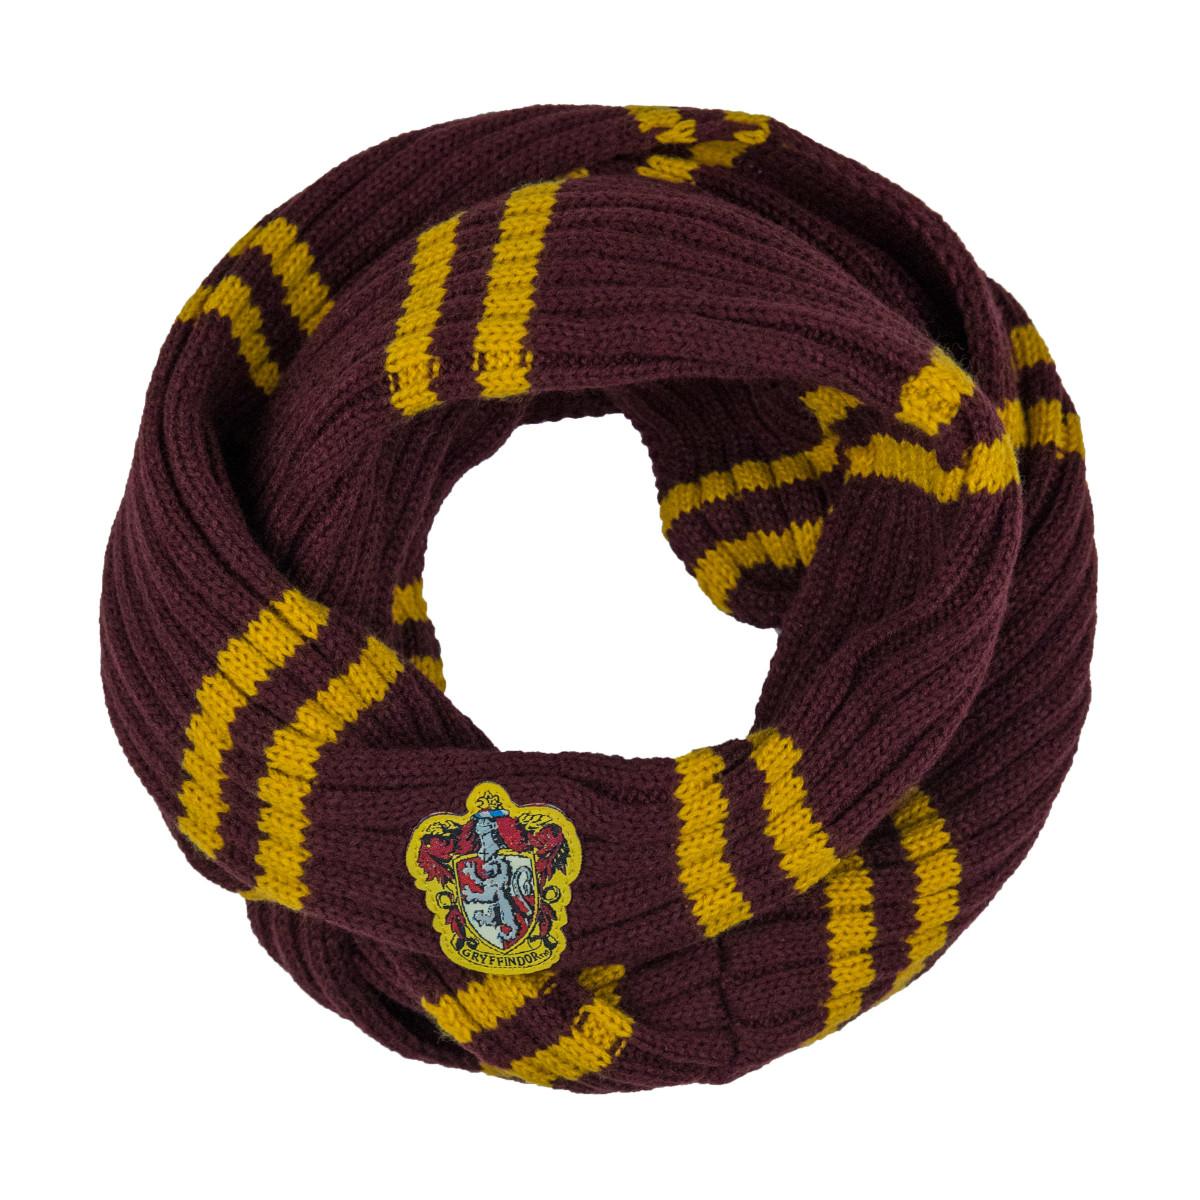 b7eb48dd0a1 Echarpe infinie - Gryffondor - Boutique Officielle Harry Potter